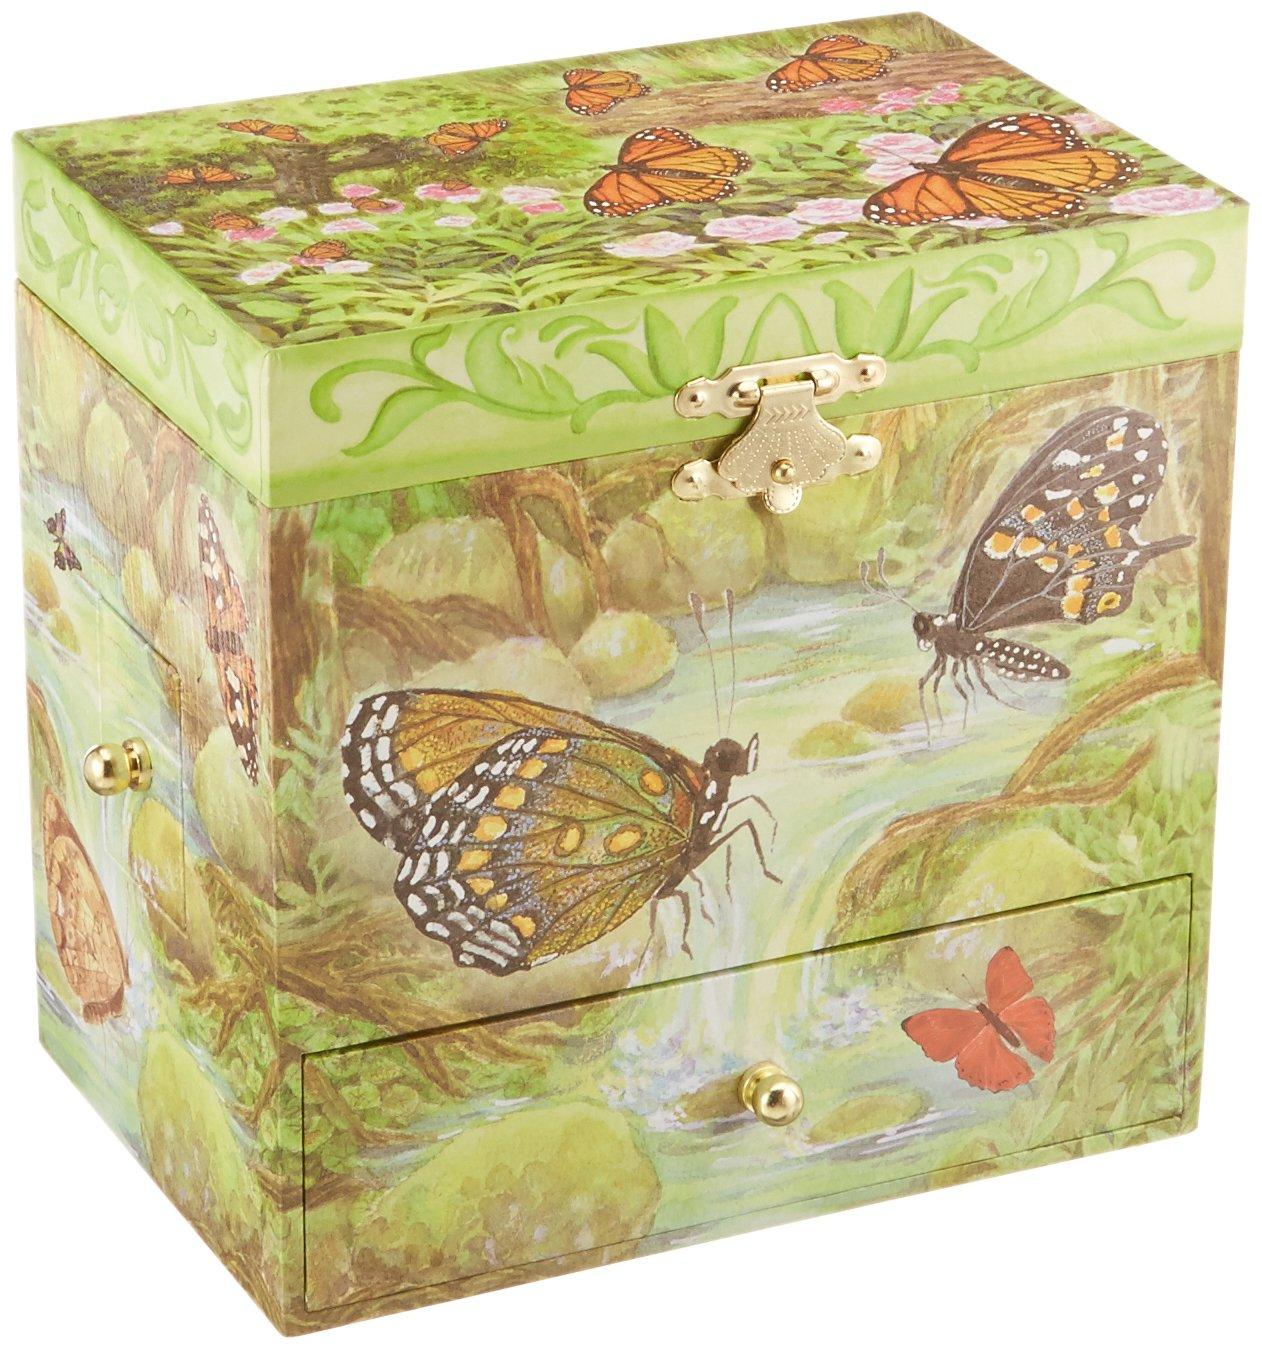 Enchantmints Monarchs Butterfly Music Jewelry Box by Enchantmints (Image #2)